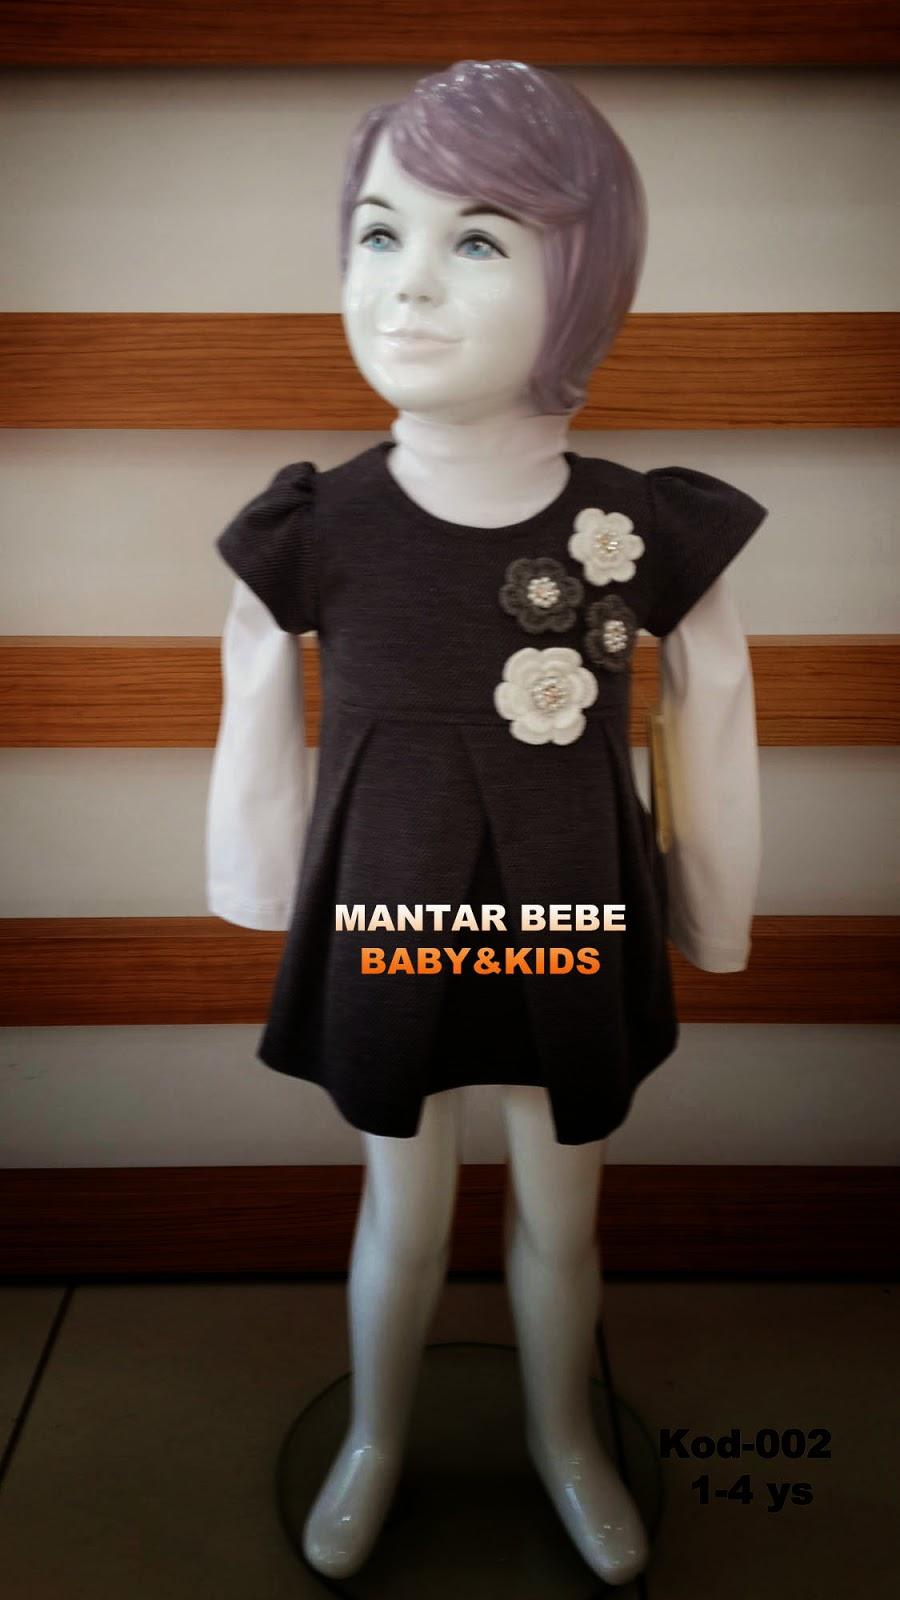 MANTAR BEBE ÇOCUK GİYİM - KOD002